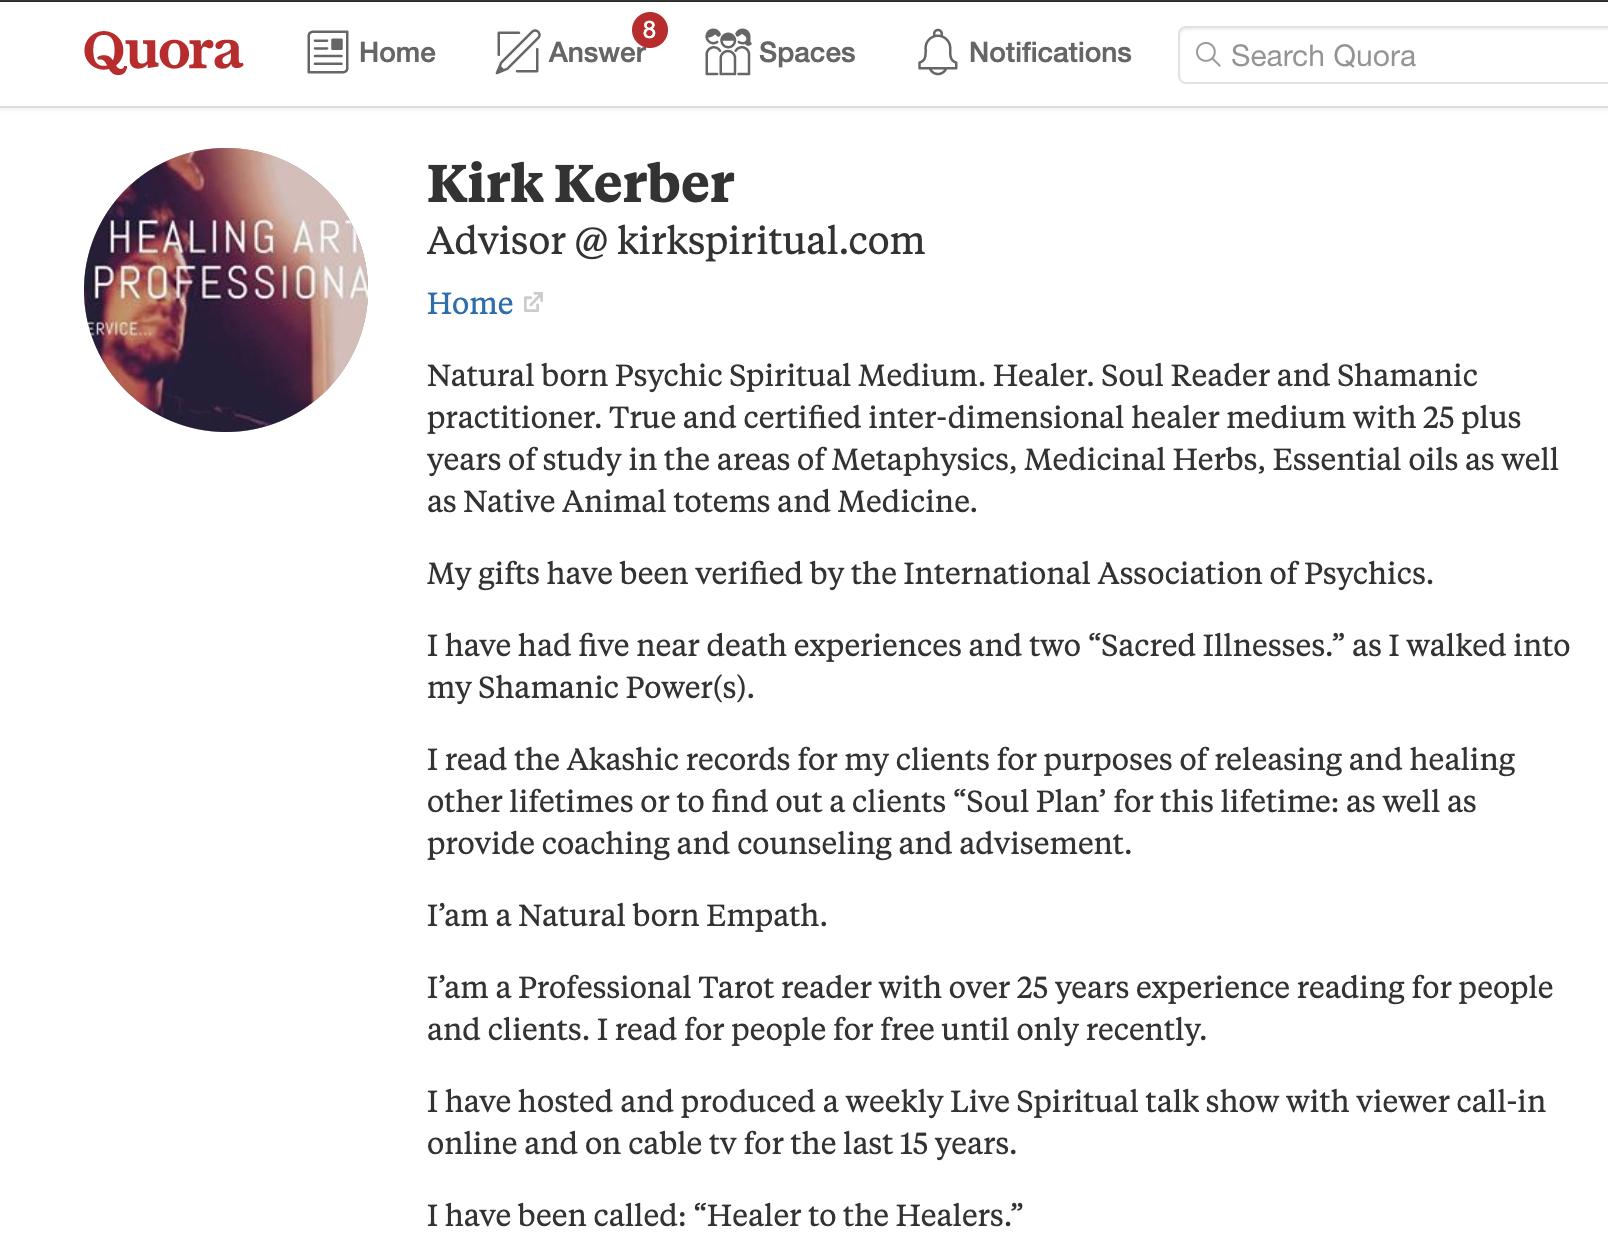 Kirk Kerber Quora answers 2019 .png